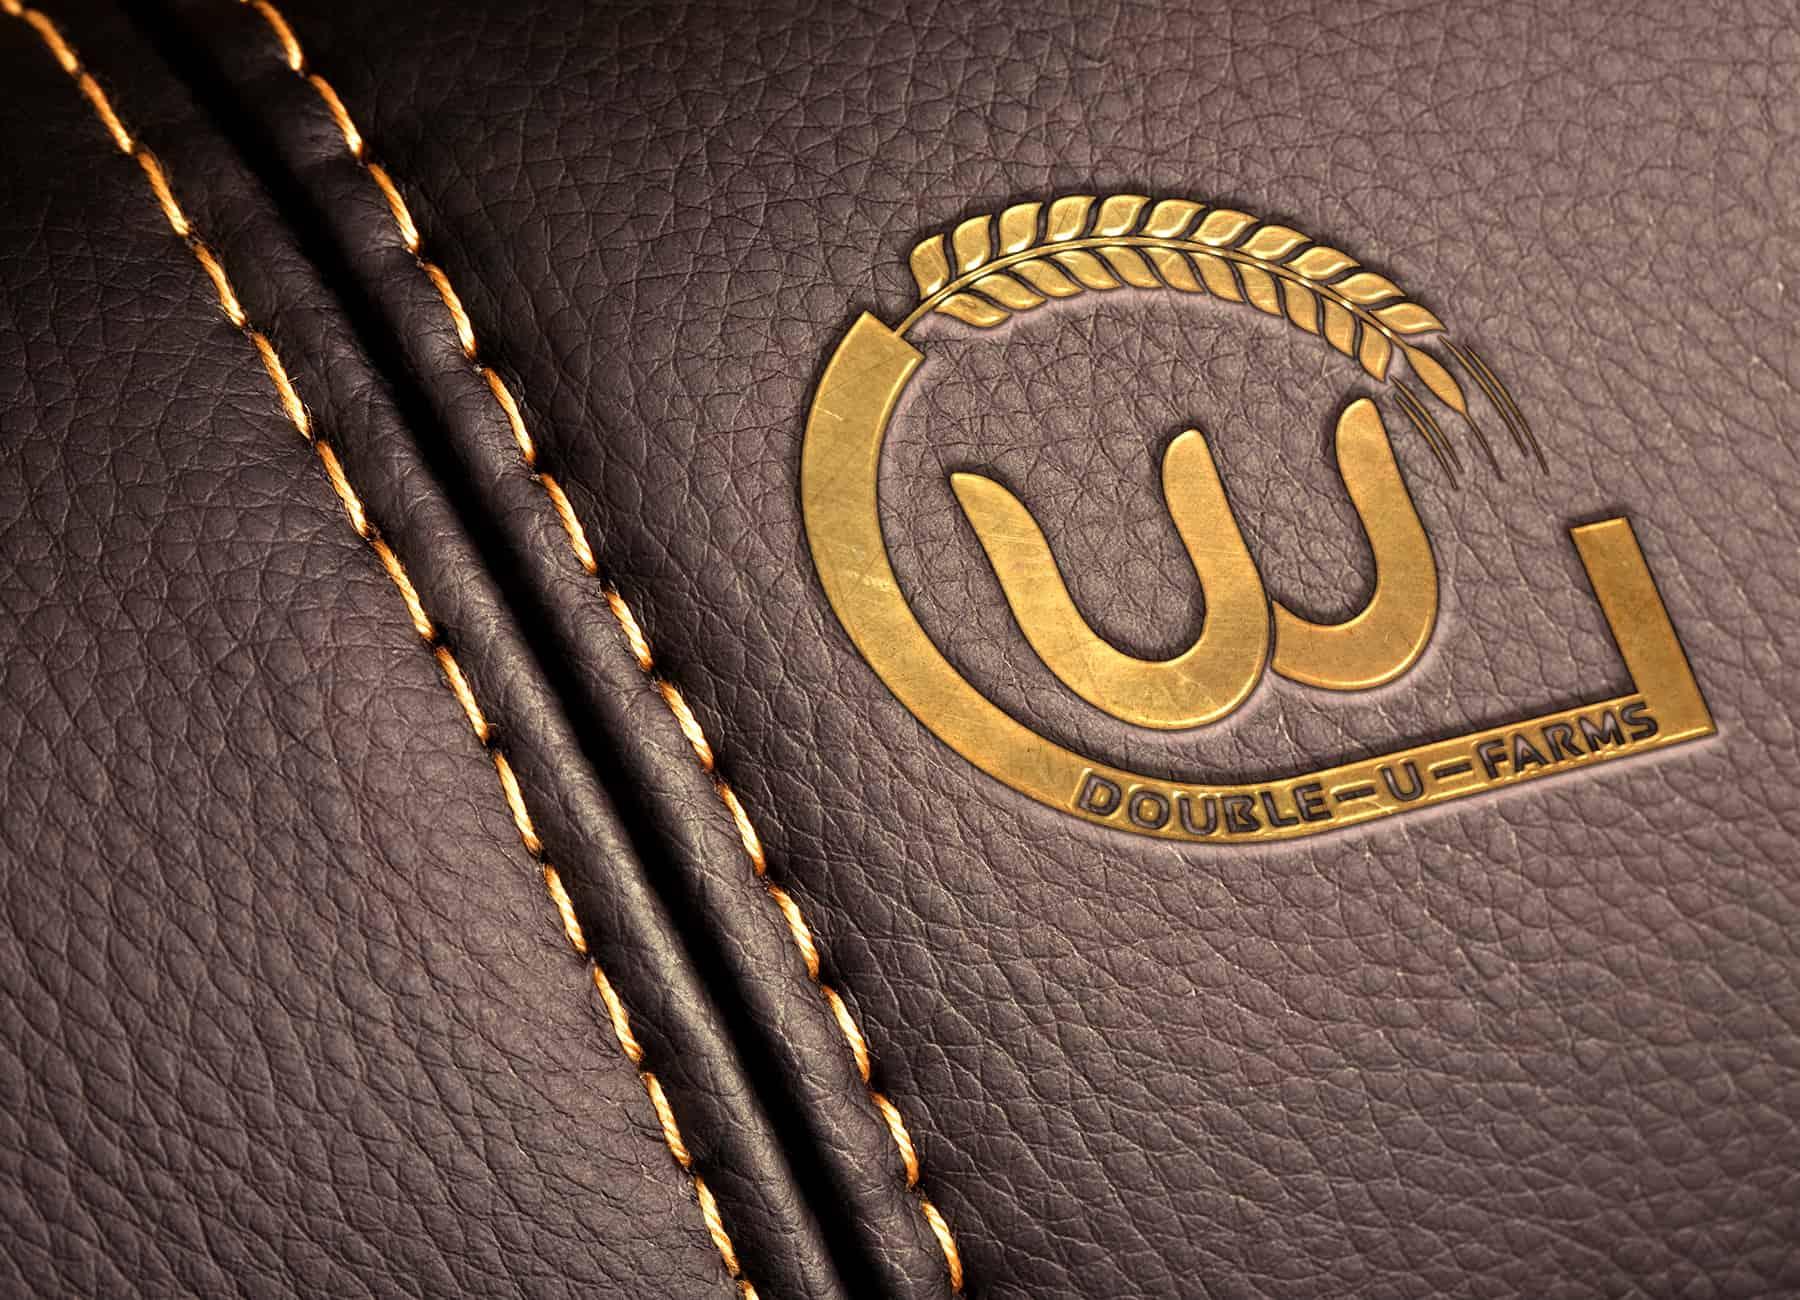 Double U Farms Logo printed in Gold on Leather Portfolio